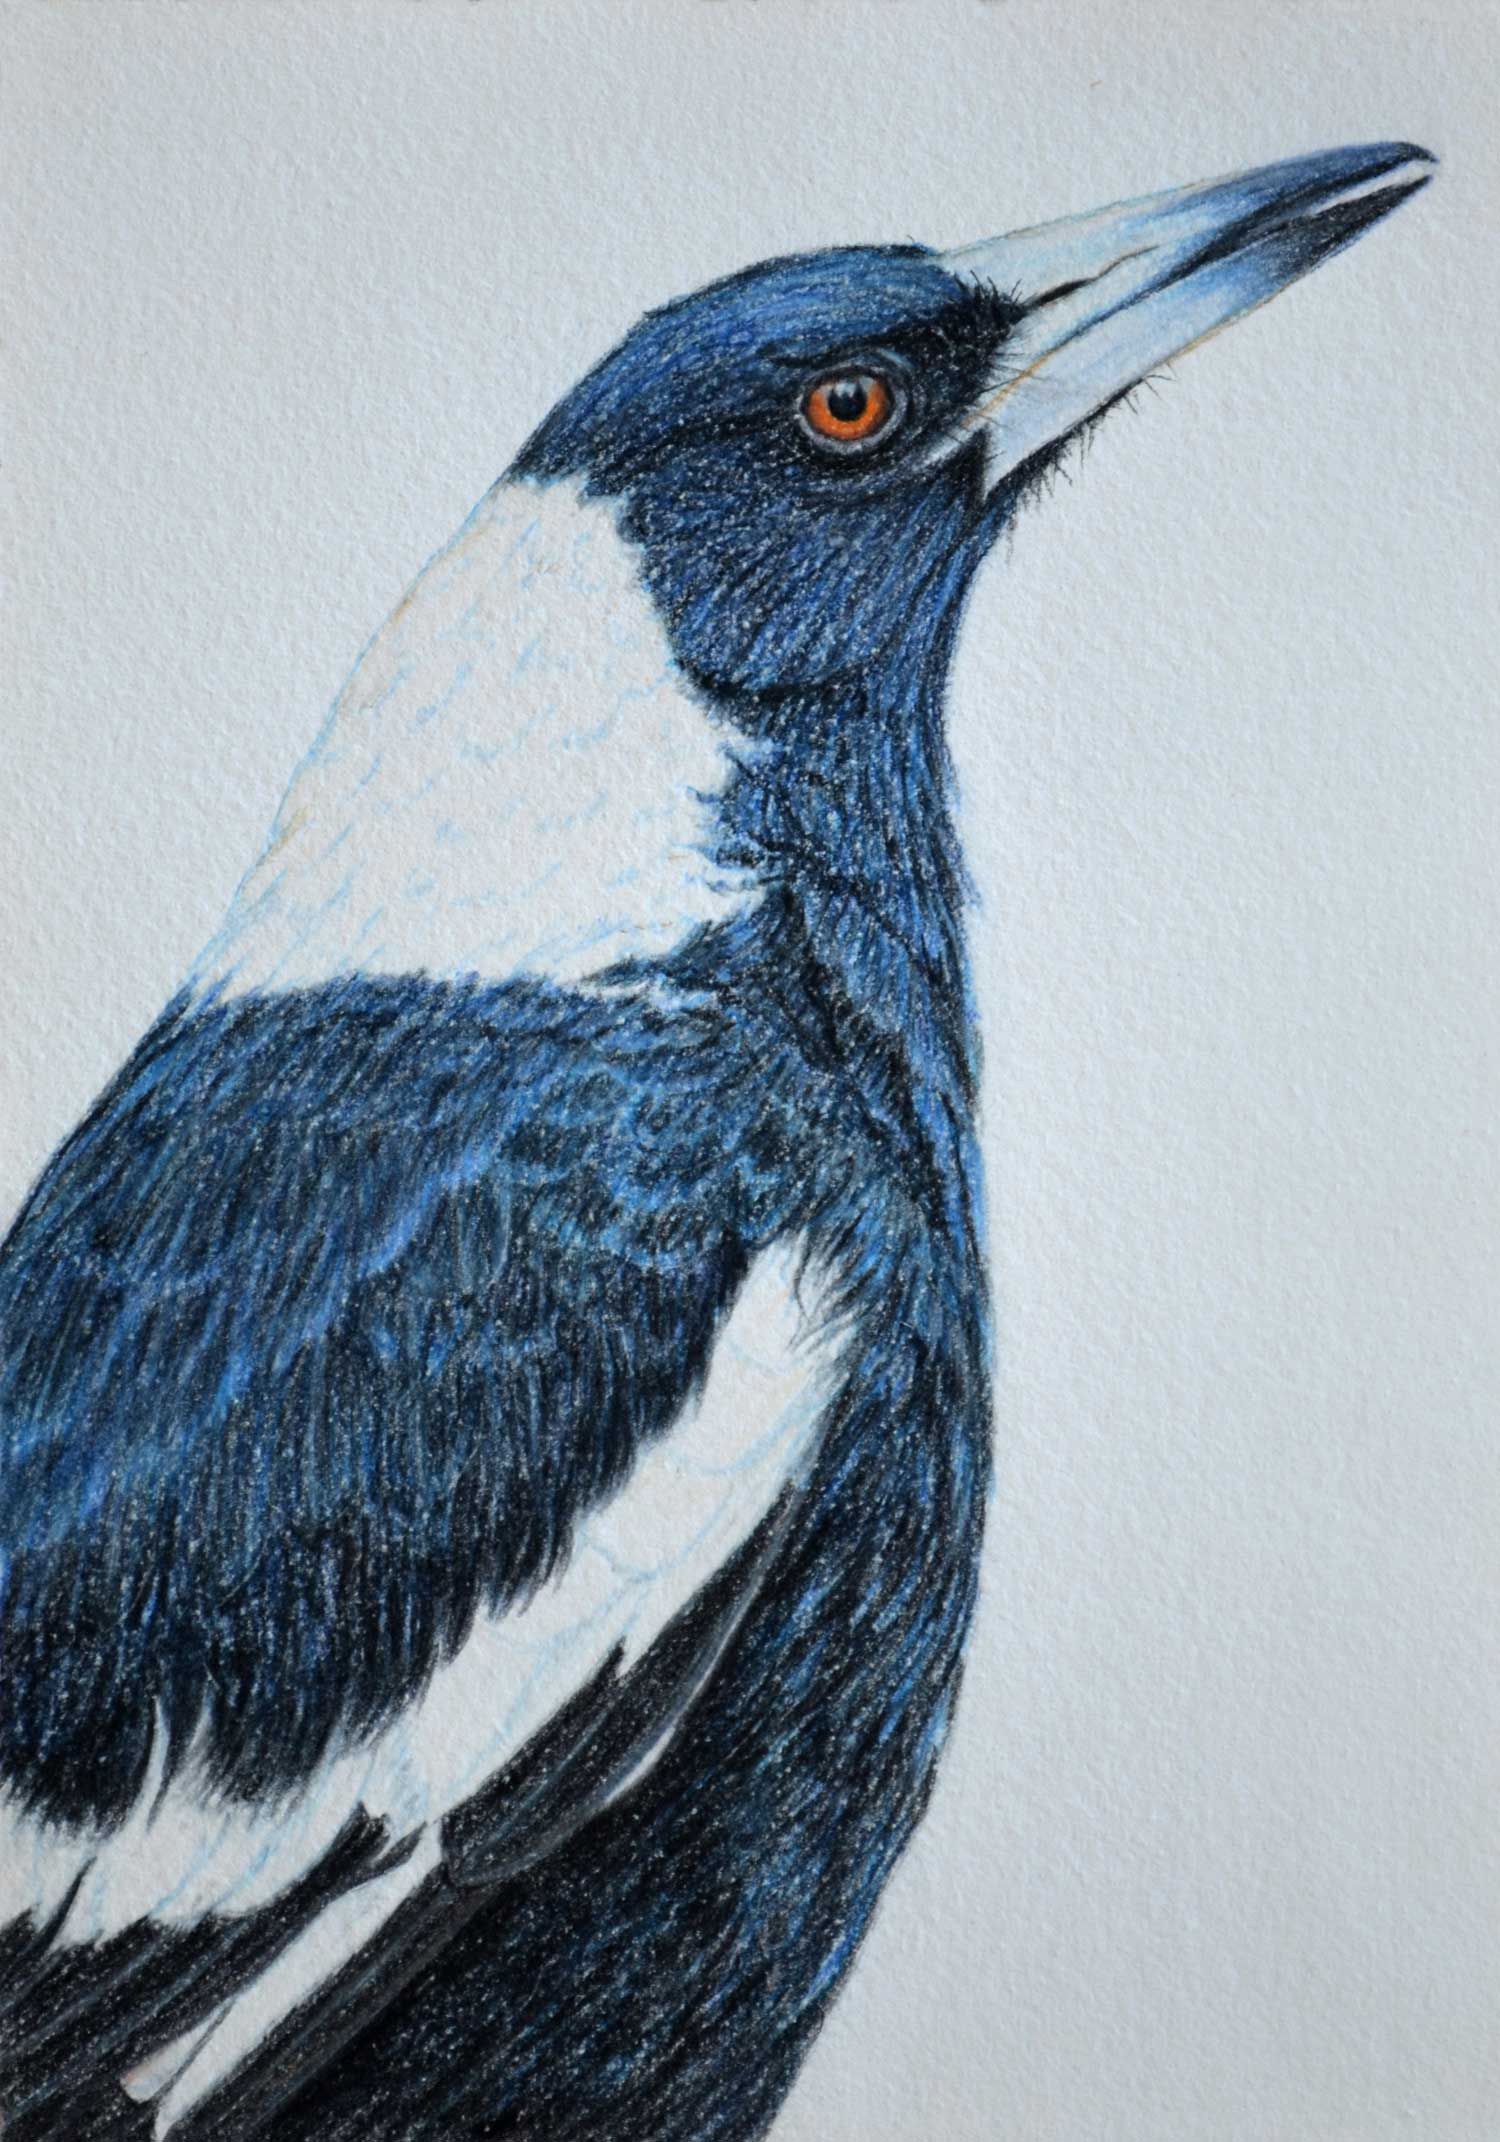 Australian Magpie 30 x 21 cm  Pastel on handmade paper  SOLD